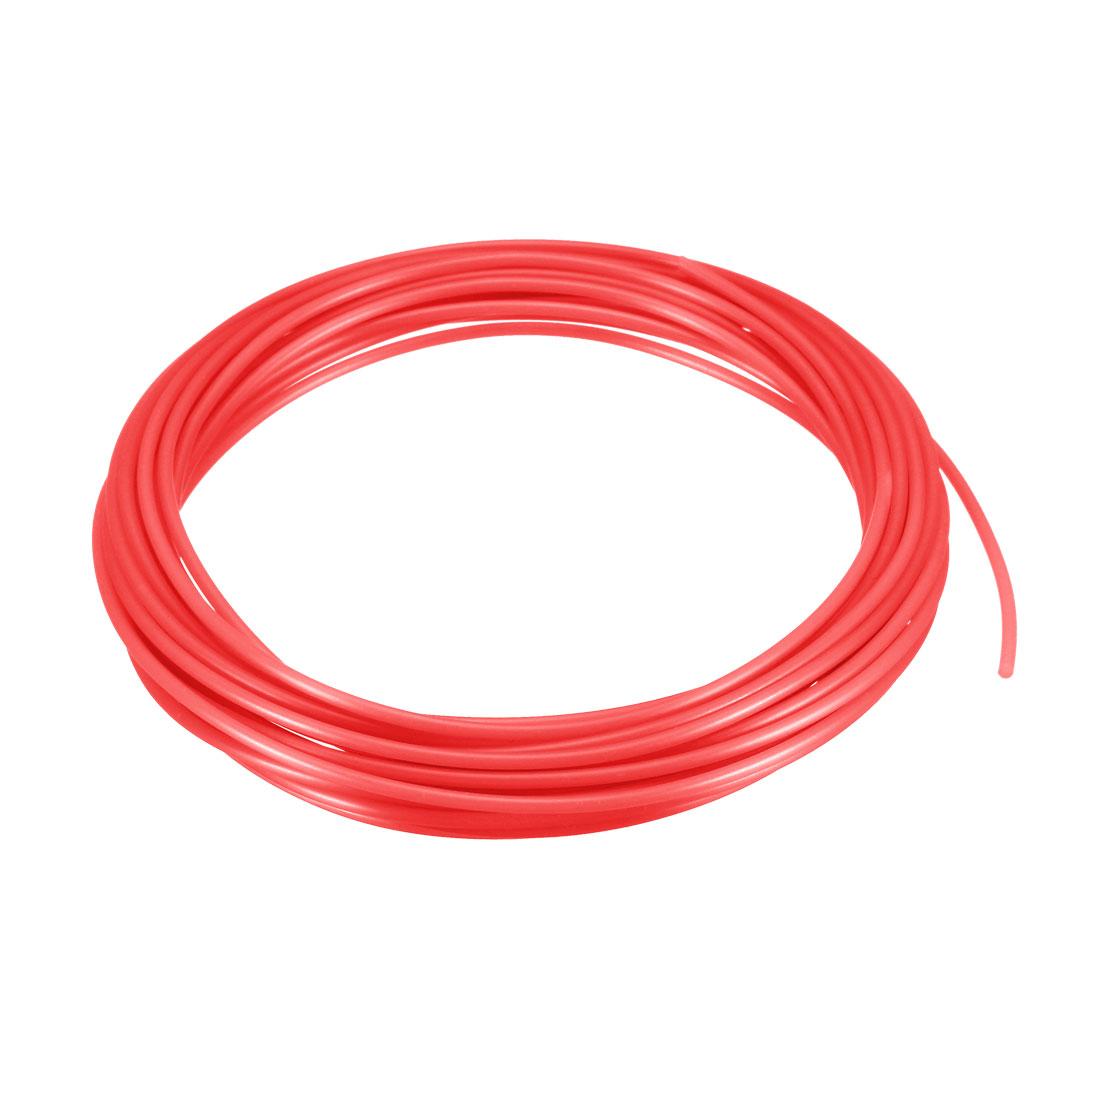 5 Meter/16 Ft PLA 3D Pen/3D Printer Filament, 1.75 mm Fluorescent Rose